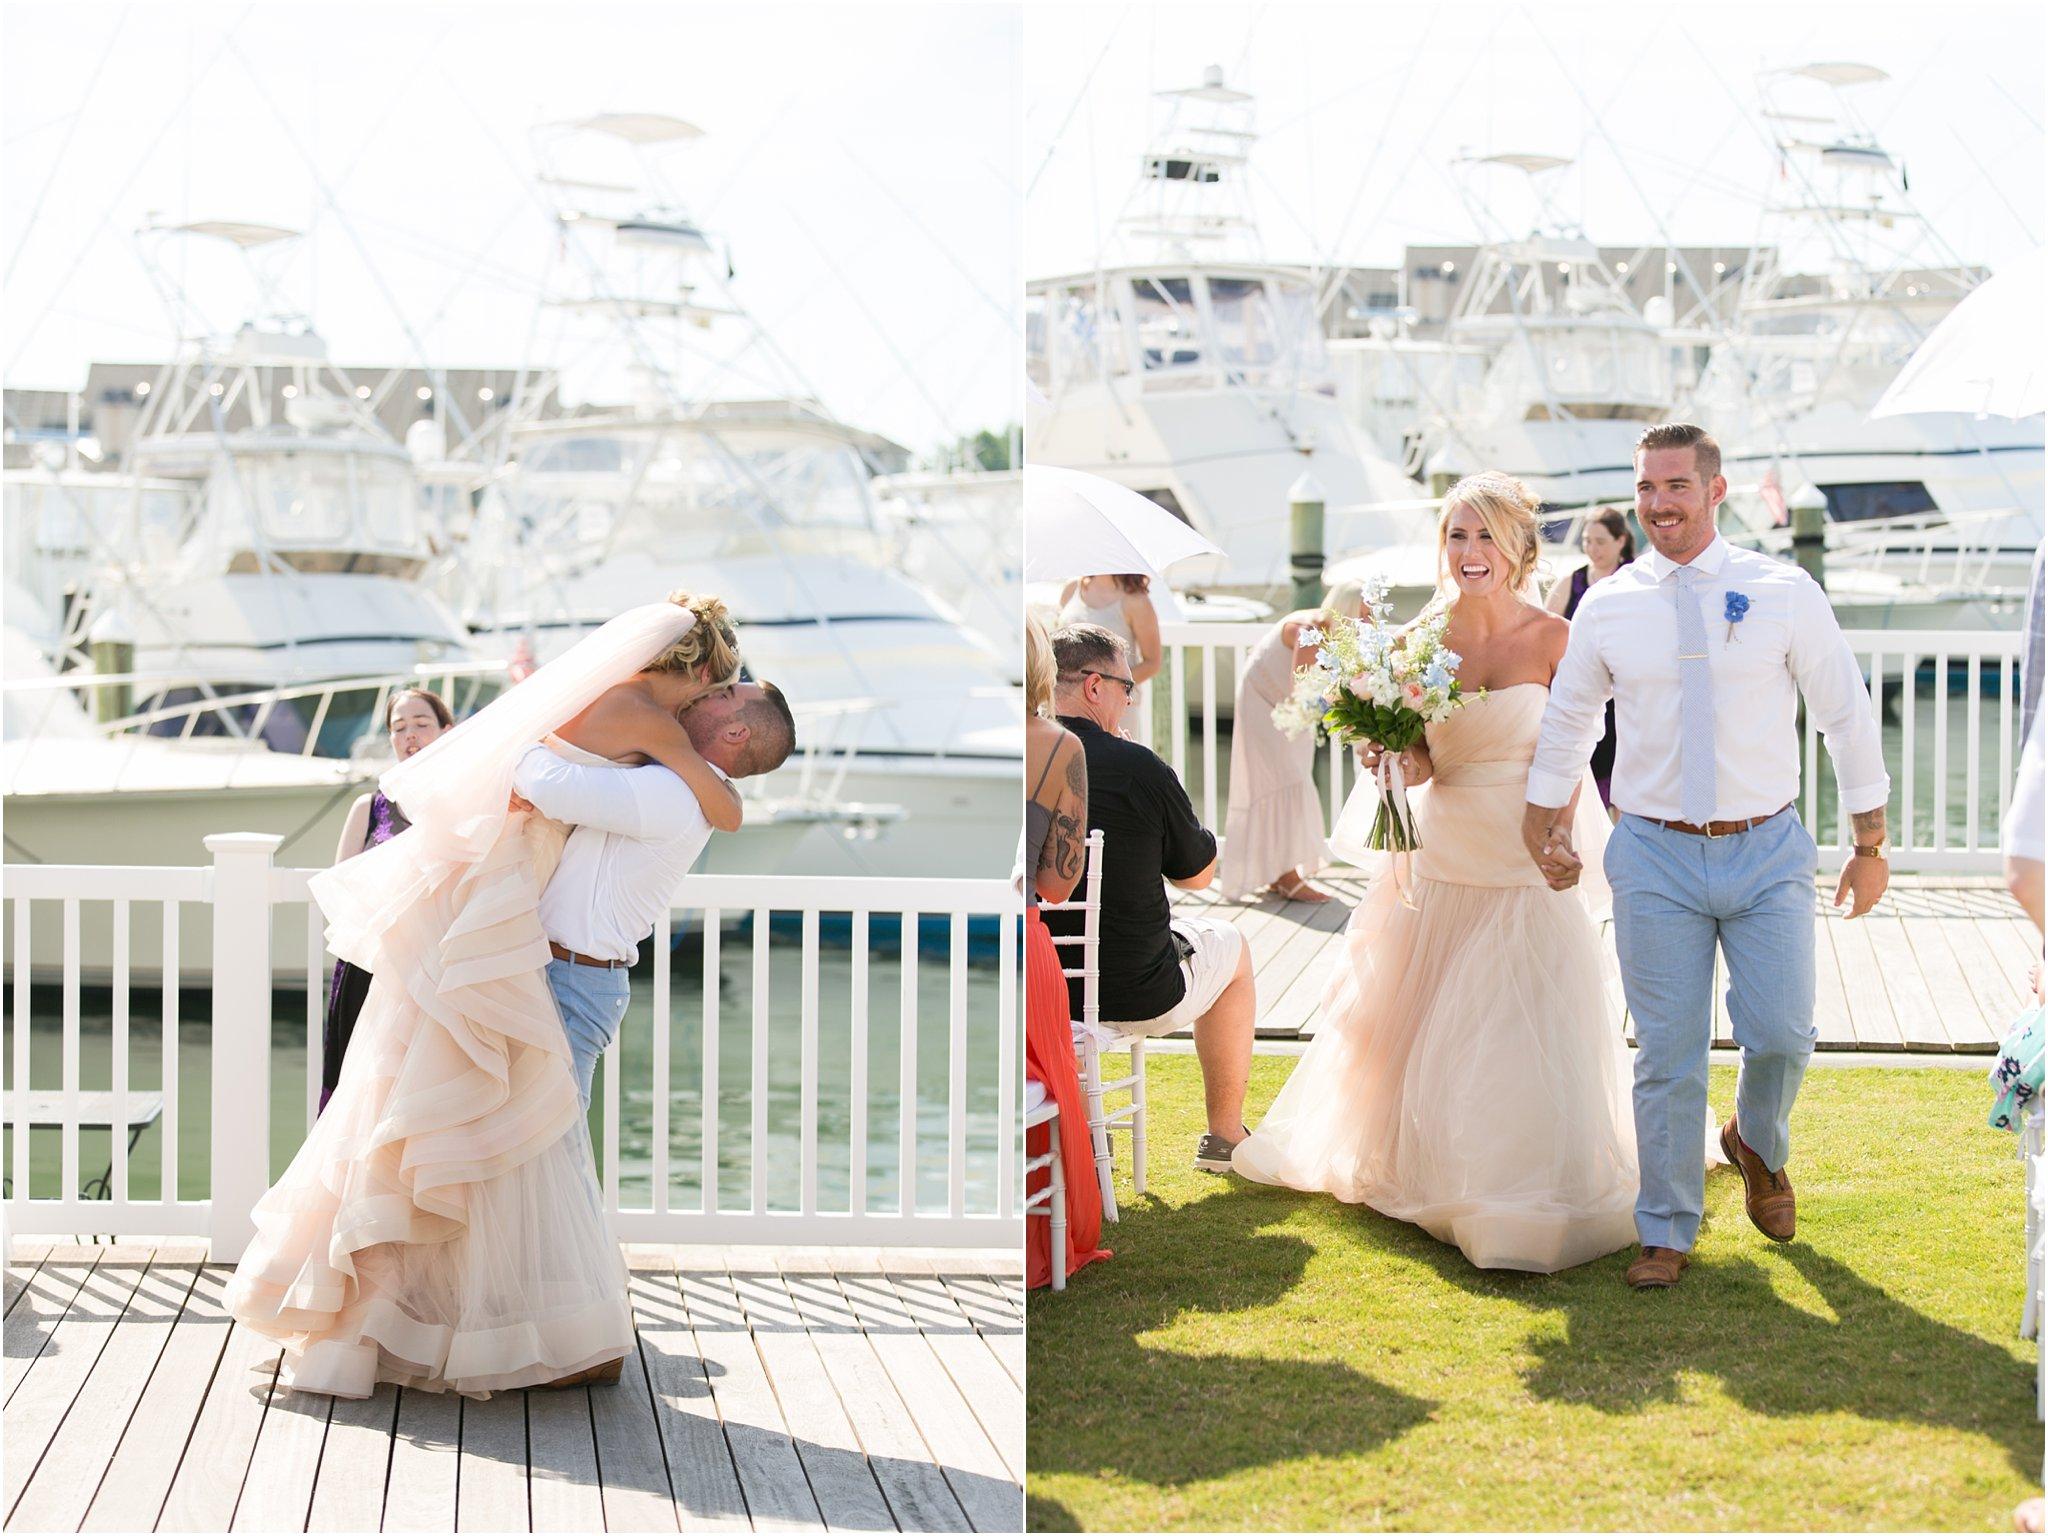 jessica_ryan_photography_virginia_beach_water_tabe_wedding_vera_wang_wedding_dress_0612